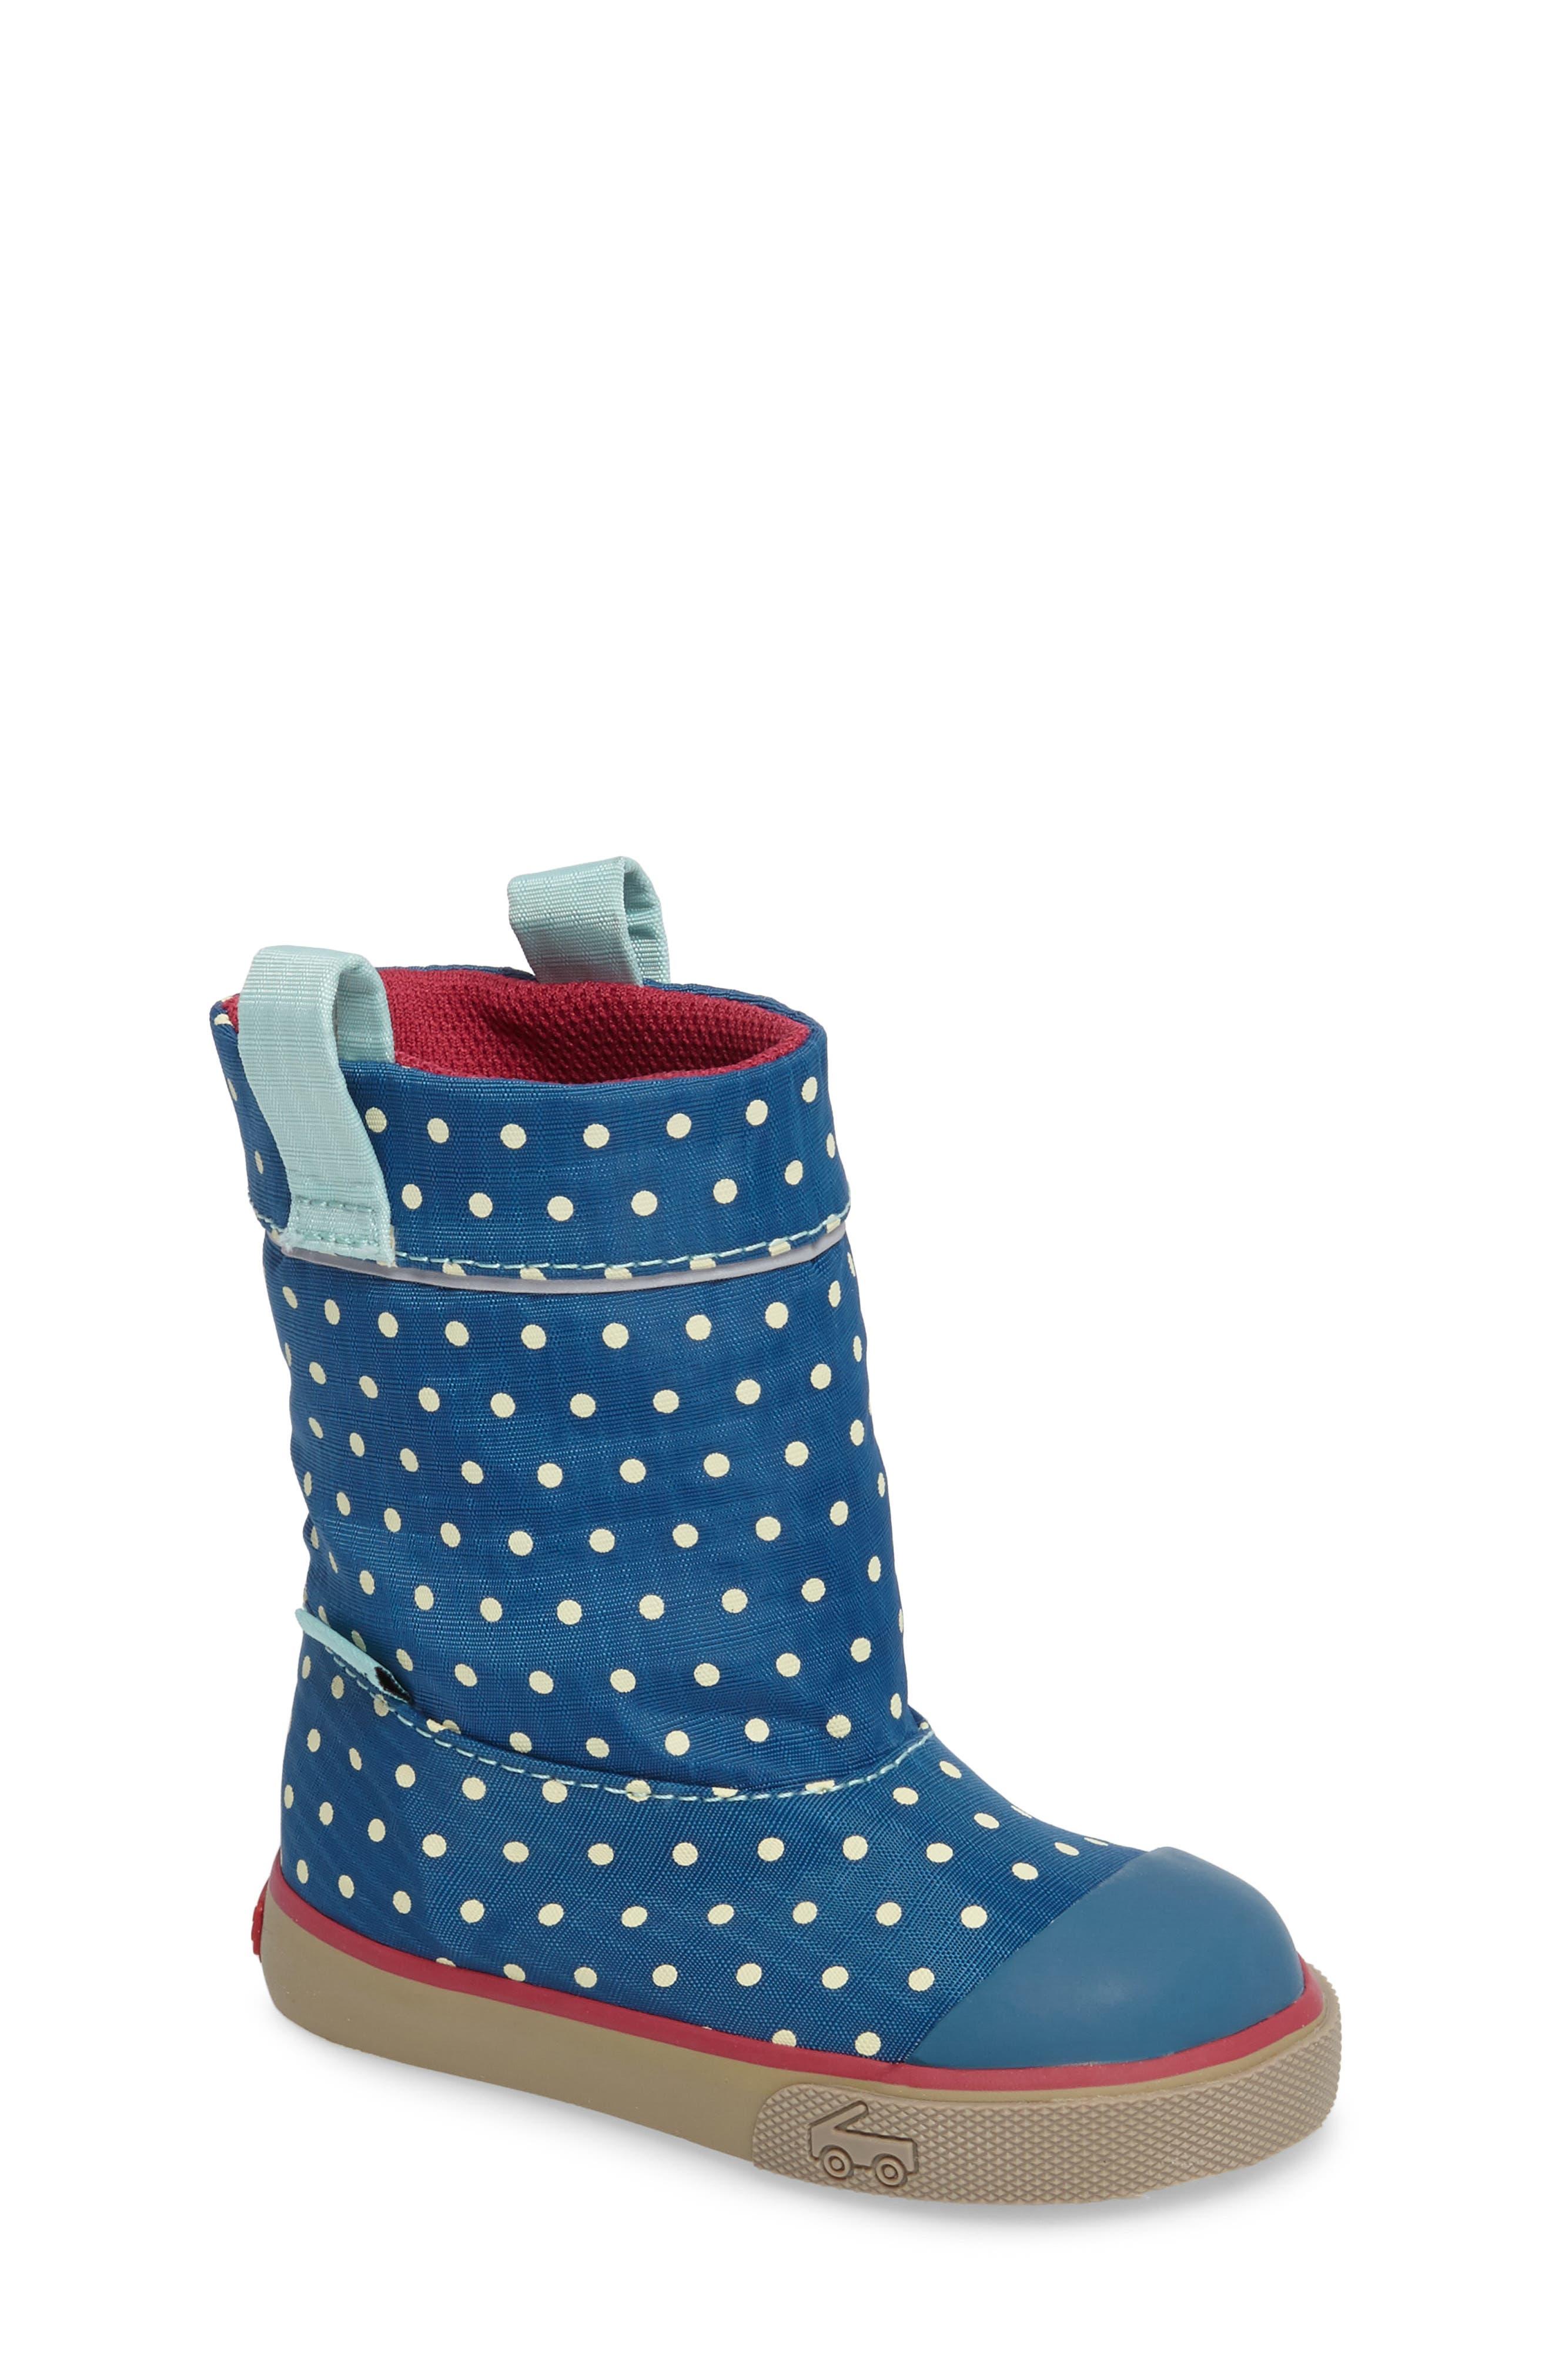 See Kai Run Montlake Waterproof Boot